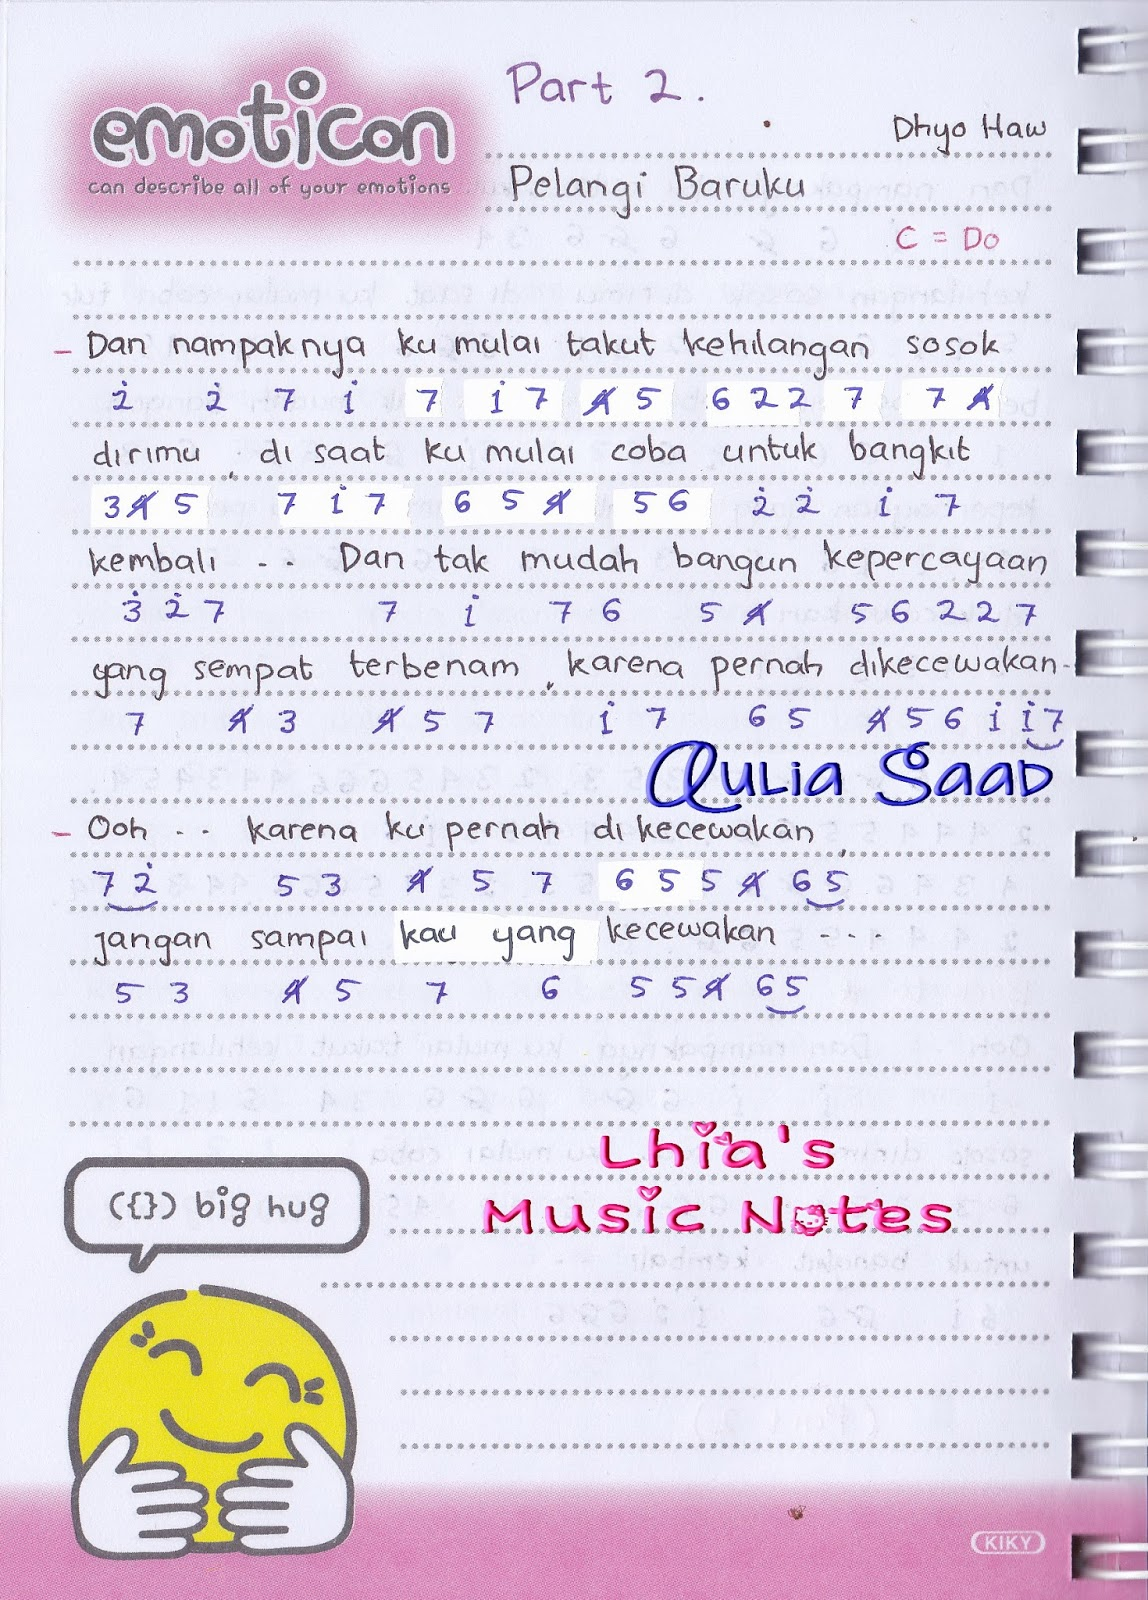 Kunci Lagu Dhyo Haw Jarak Dan Kita : kunci, jarak, Lhia's, Music, Notes